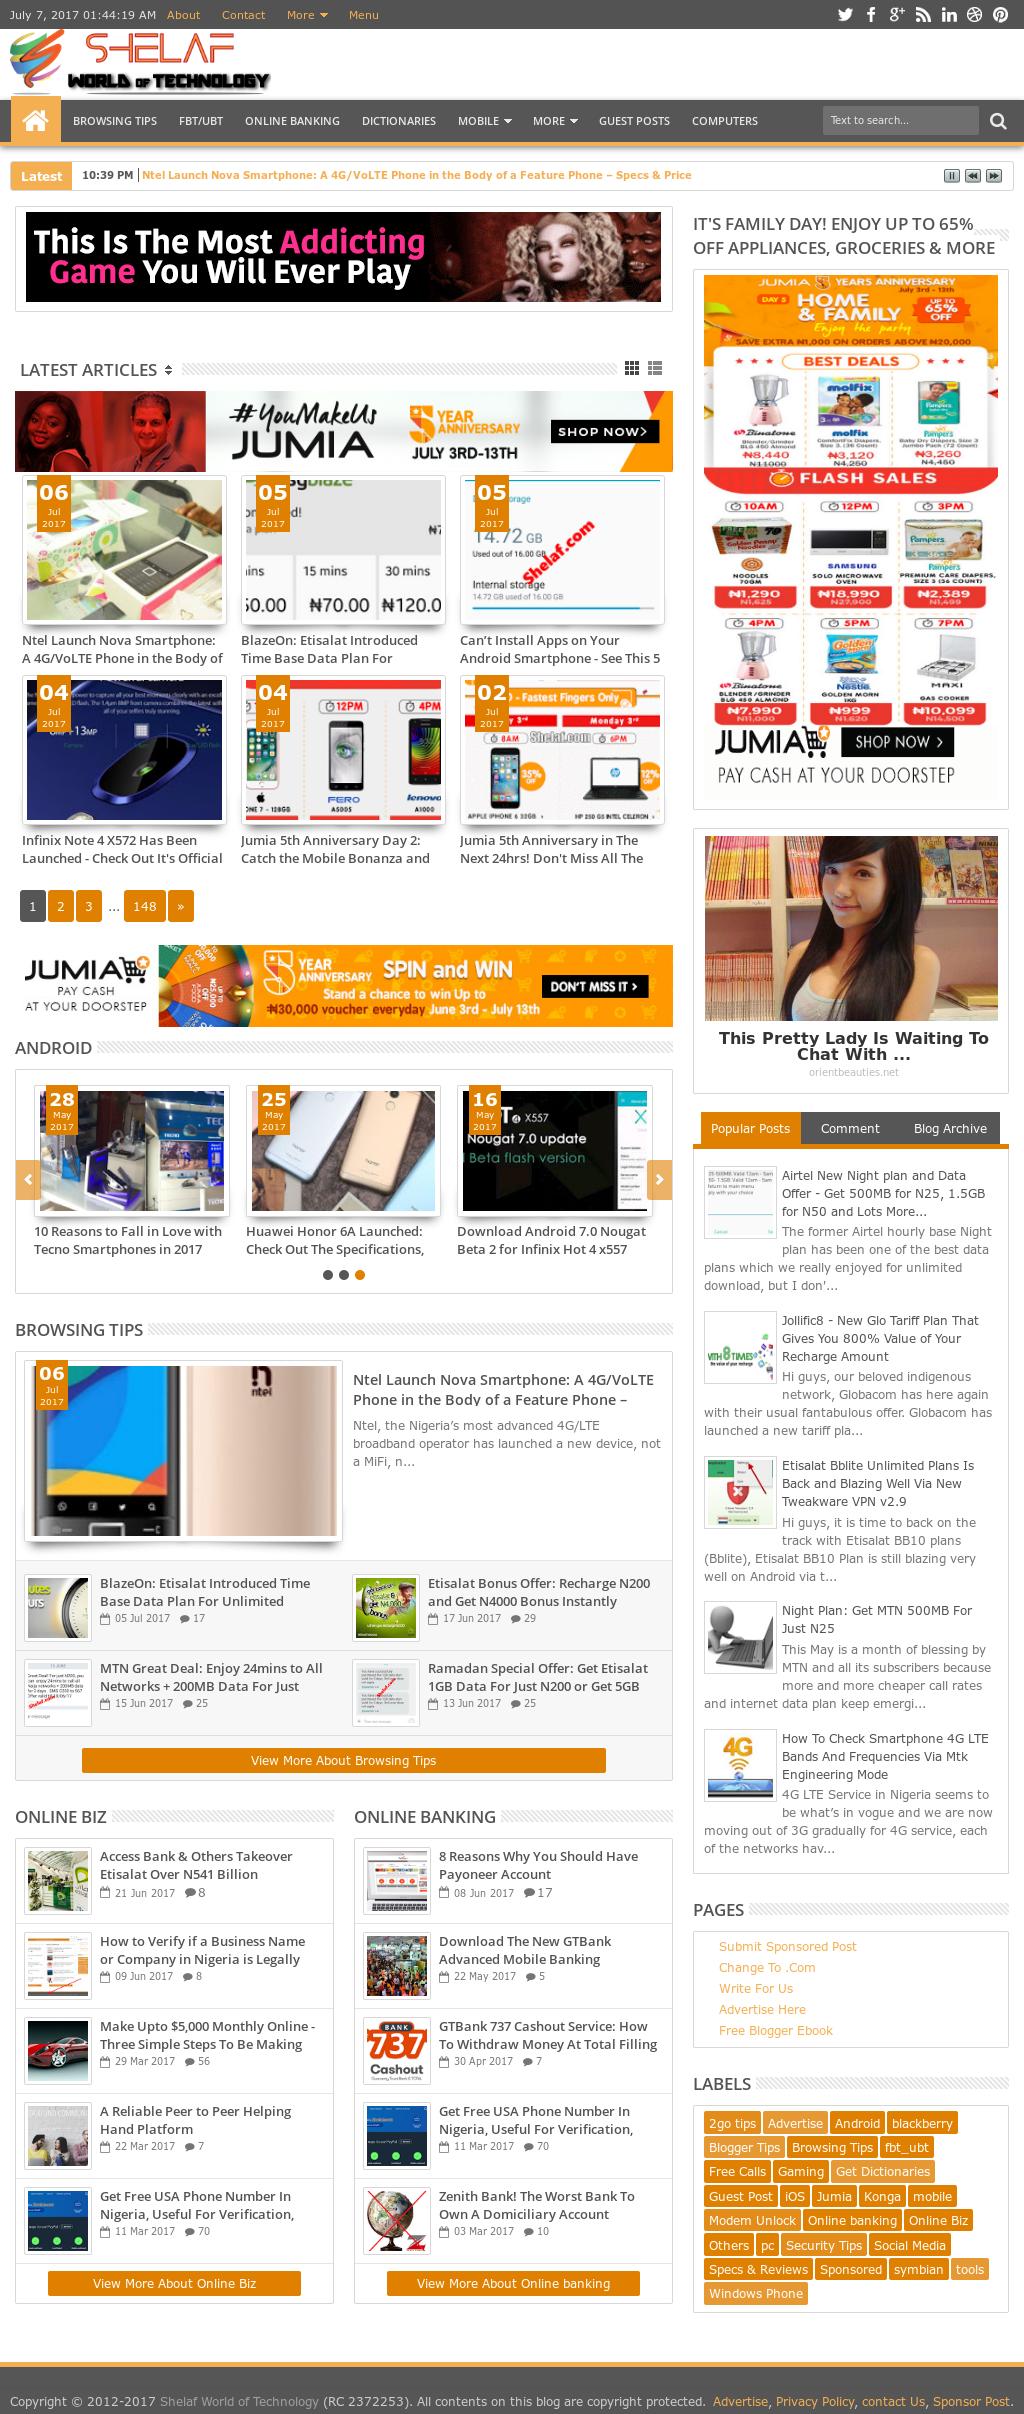 Owler Reports - Shelaf World Of Technology Blog MIUI V8